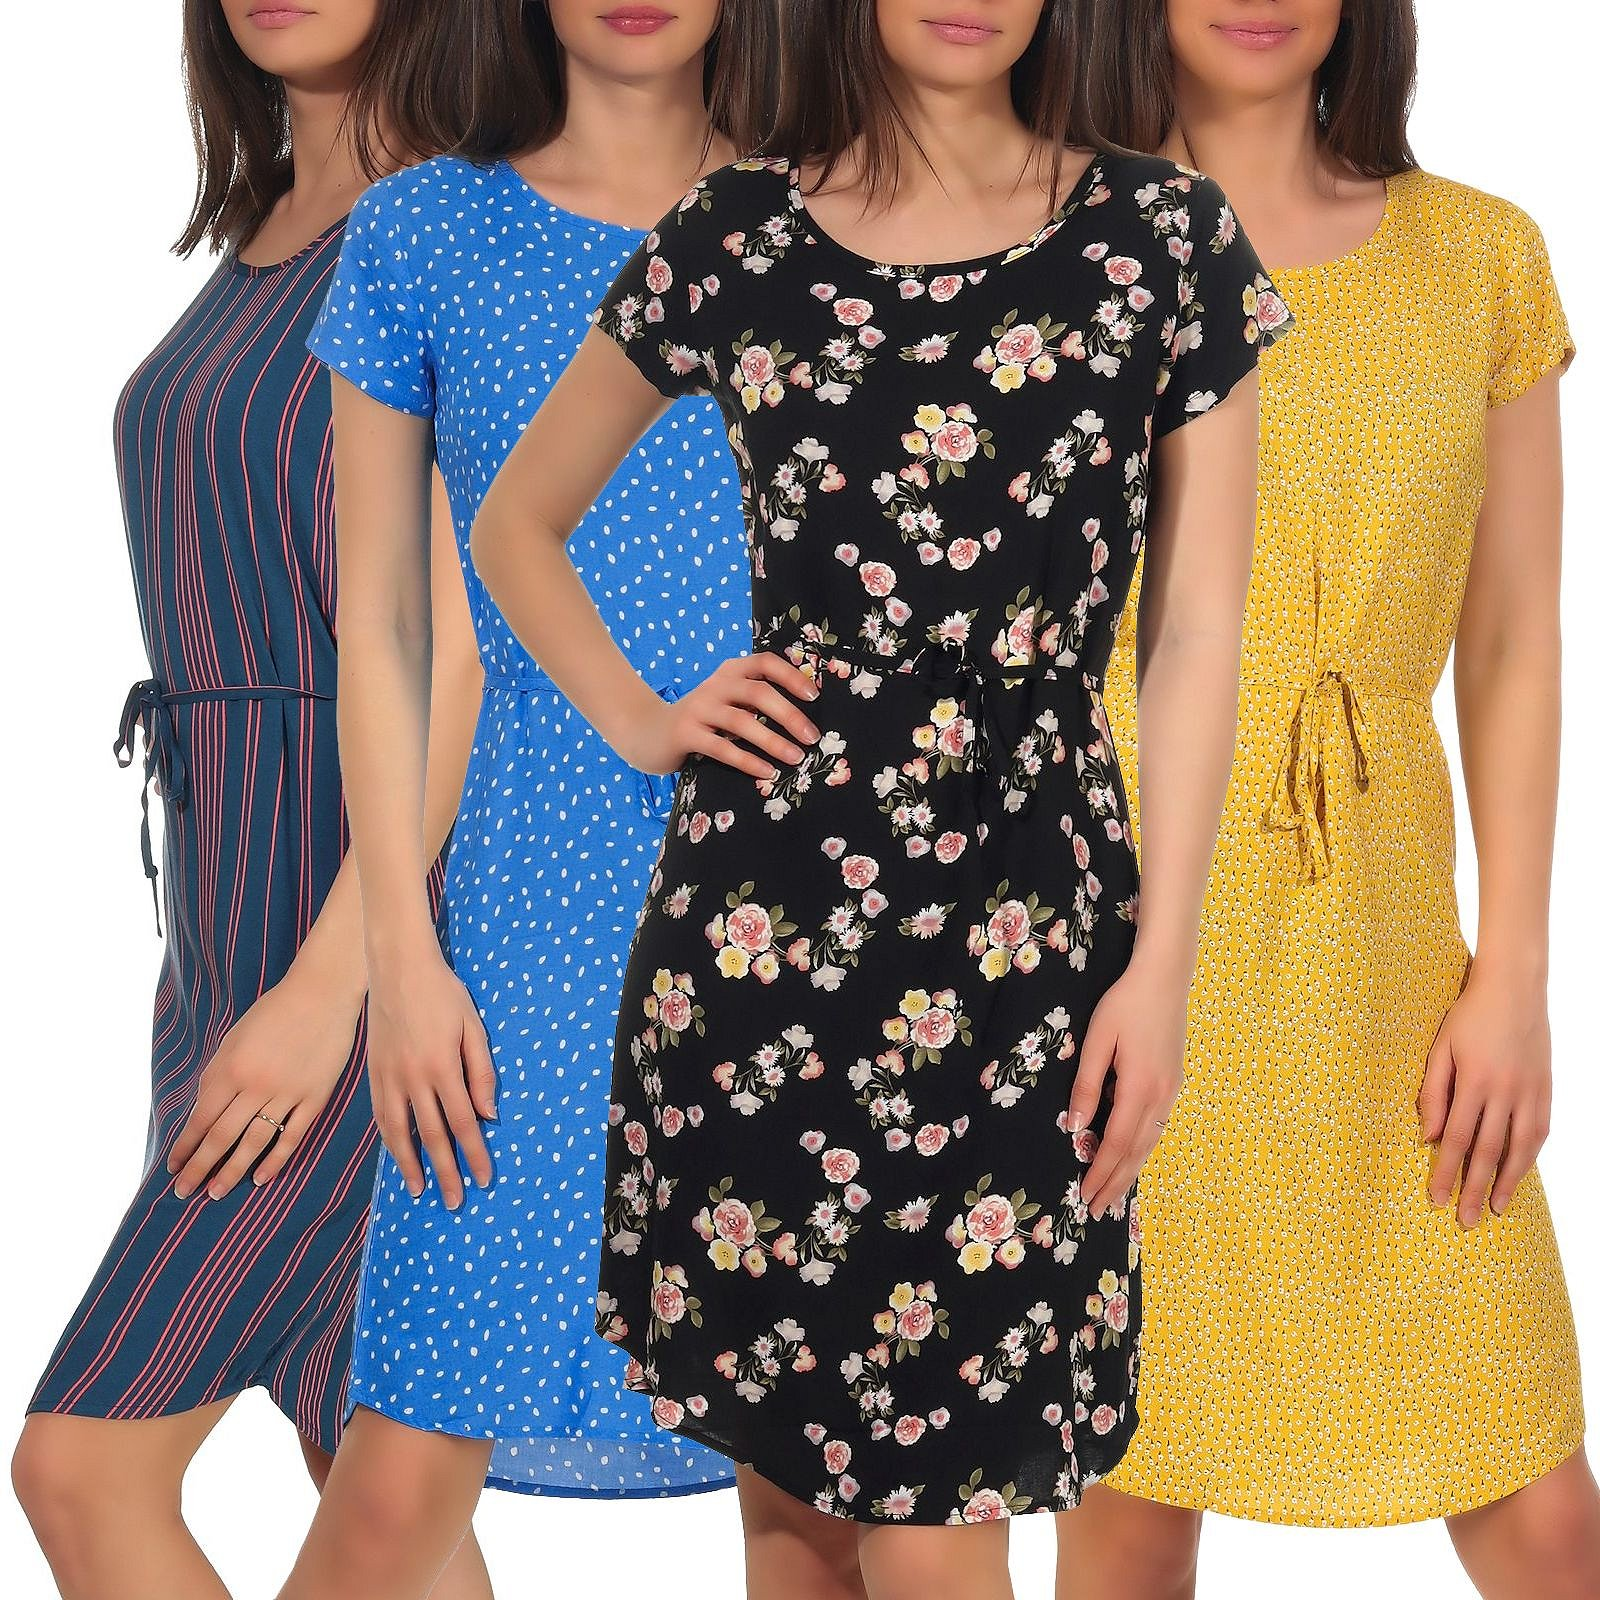 details zu damen kleid sommerkleid damenkleid knielang 100 viskose fresh  made lfm-158